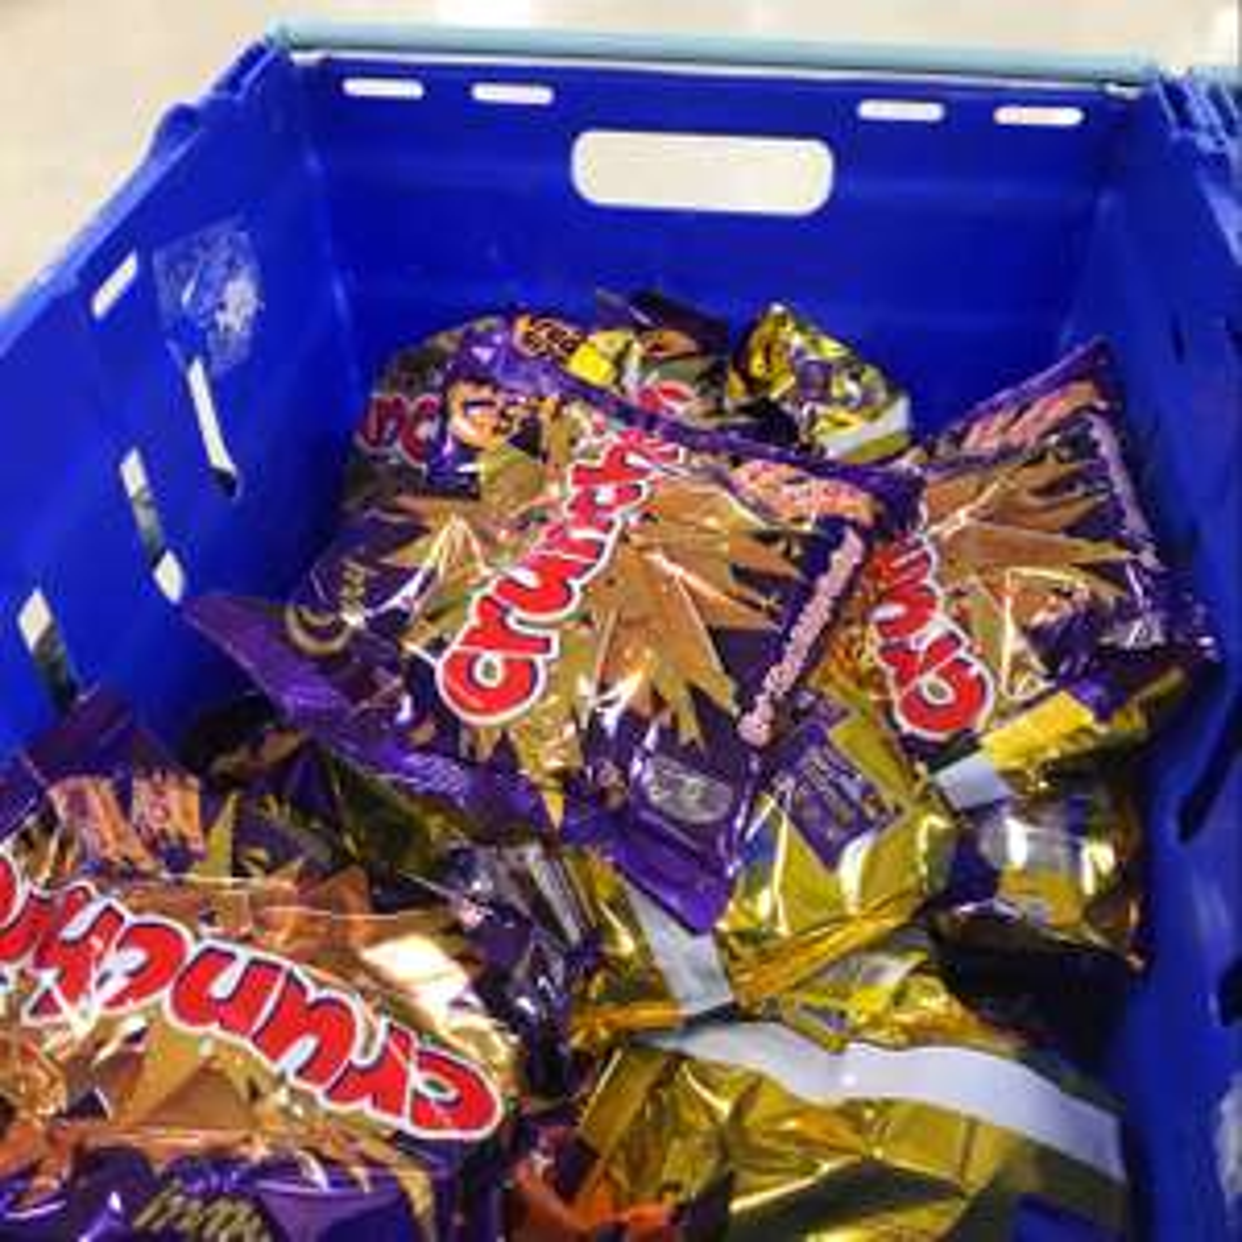 Halloween treats reduced half price - £1.39 @ Tesco